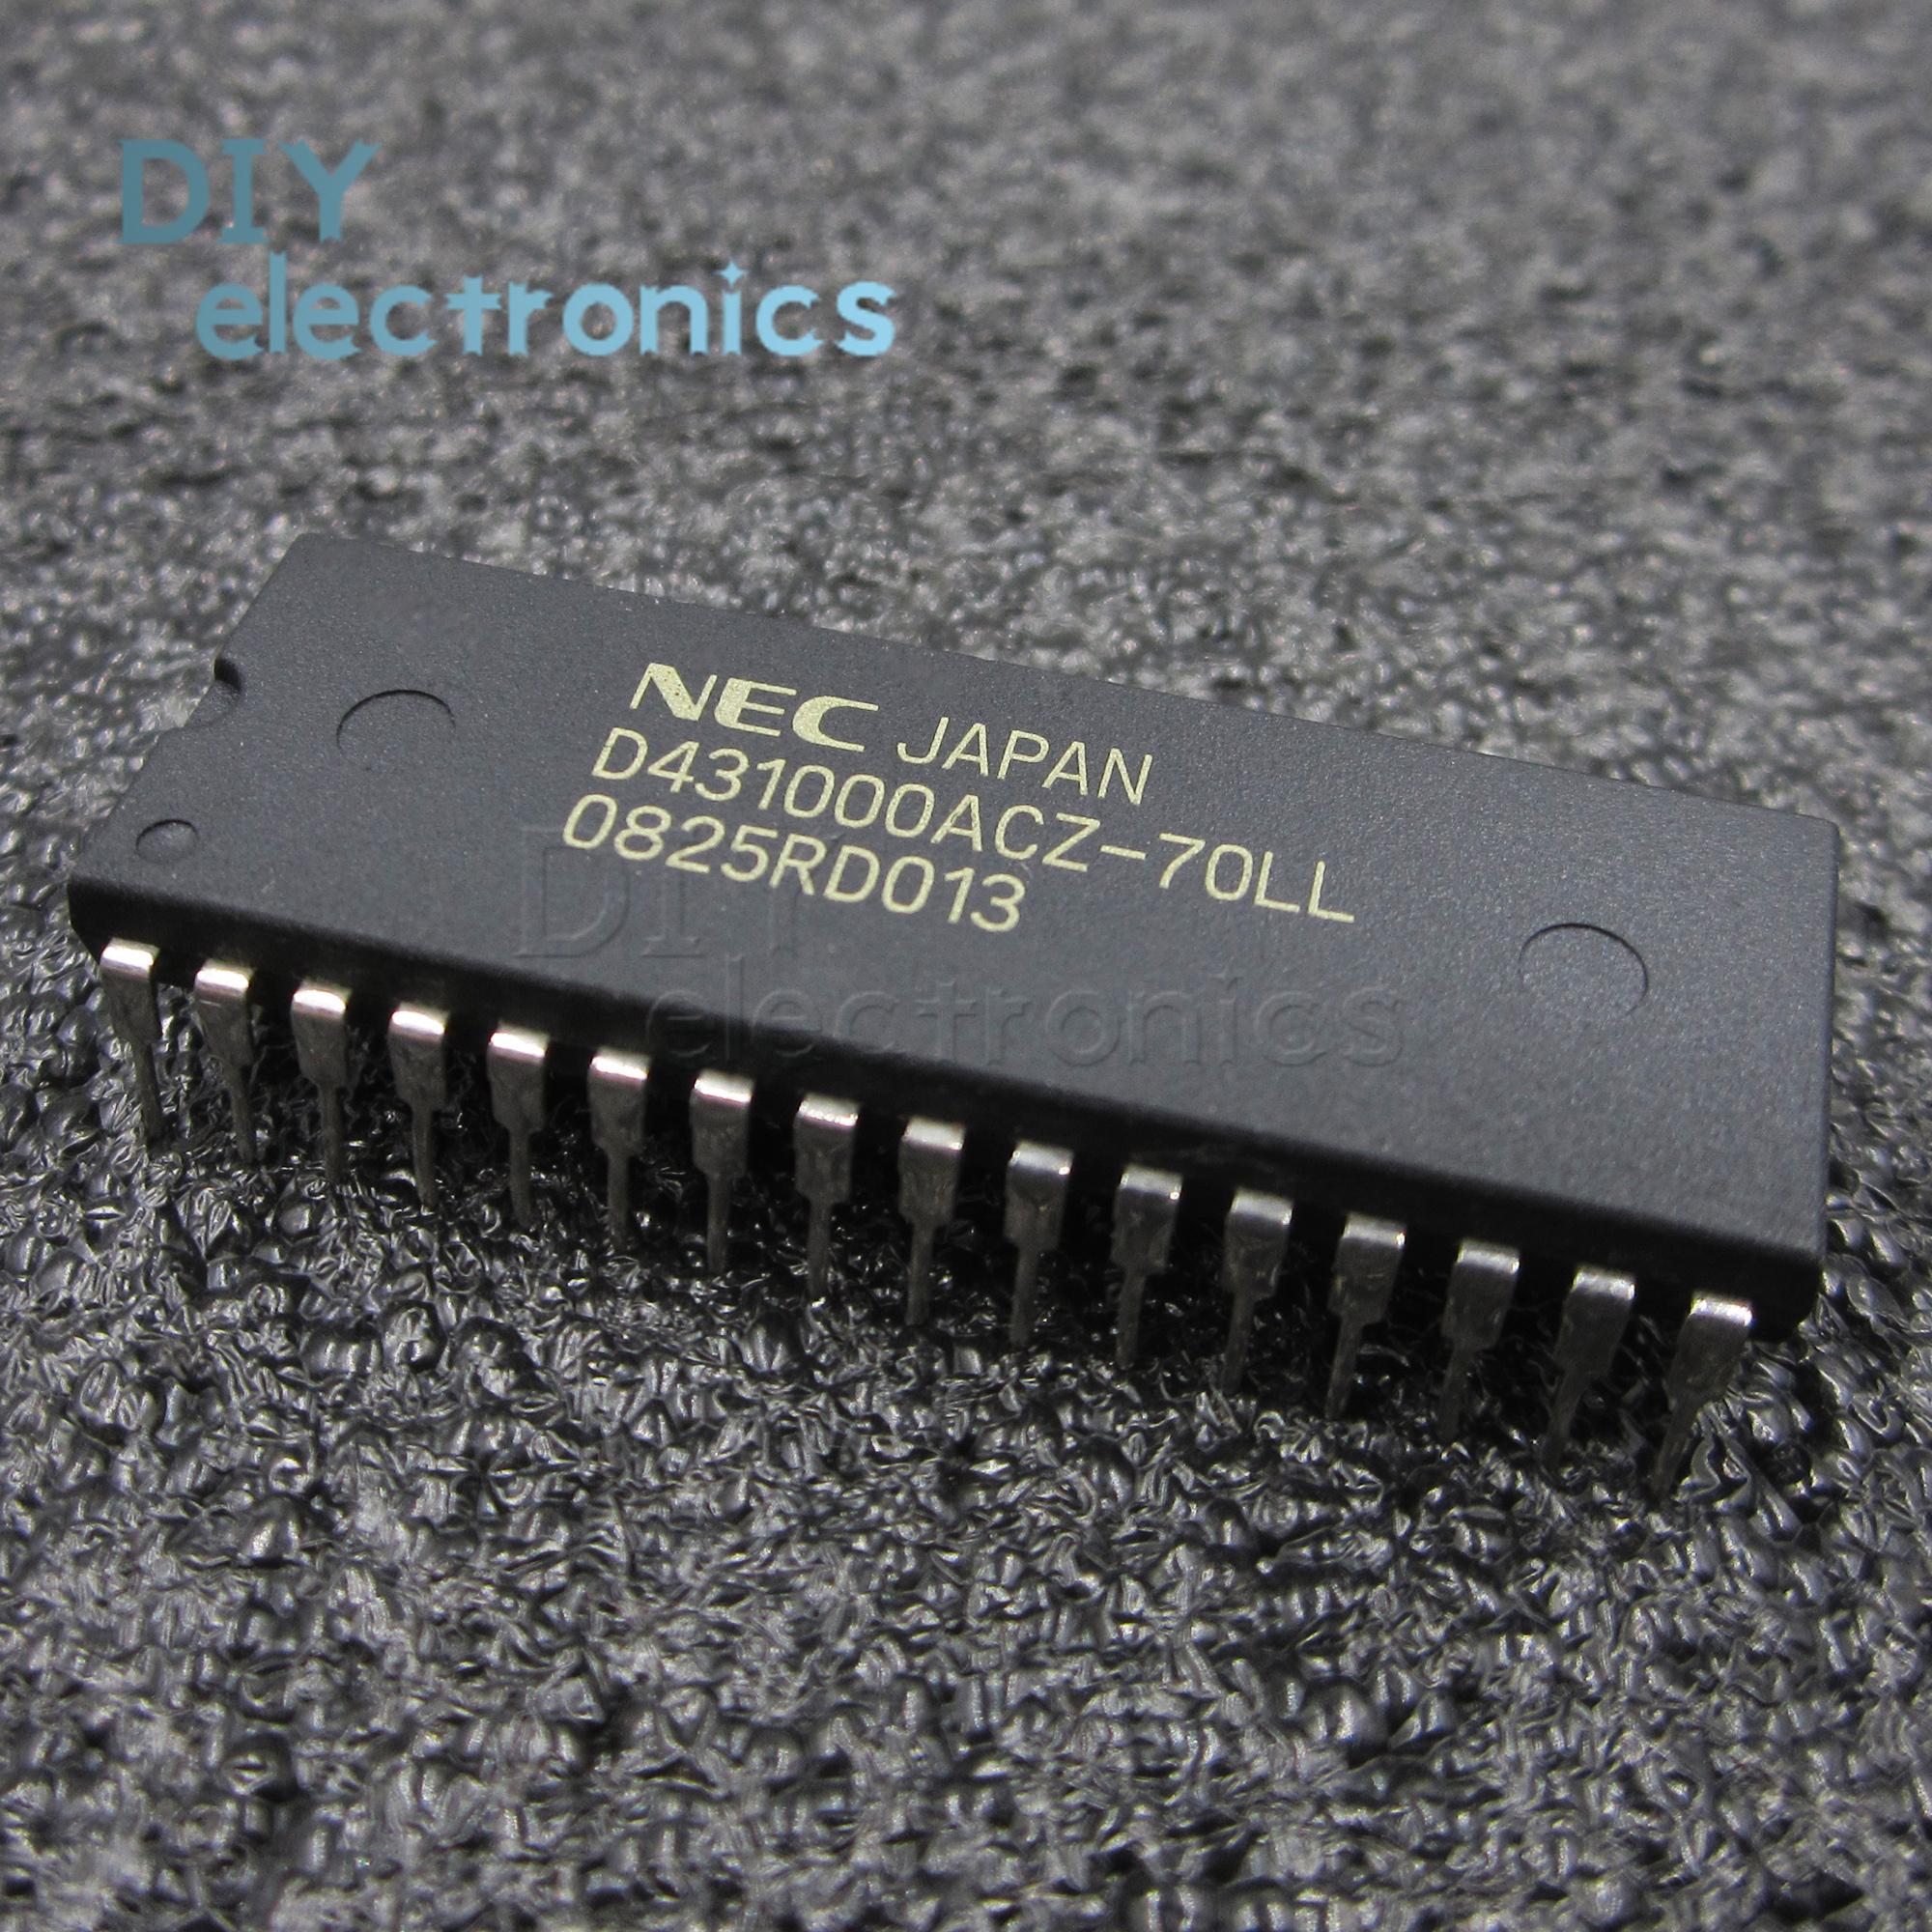 1PCS//5PCS D431000ACZ-70LL D431000 431000ACZ-70LL DIP-32 1M-BIT CMOS STATIC RAM